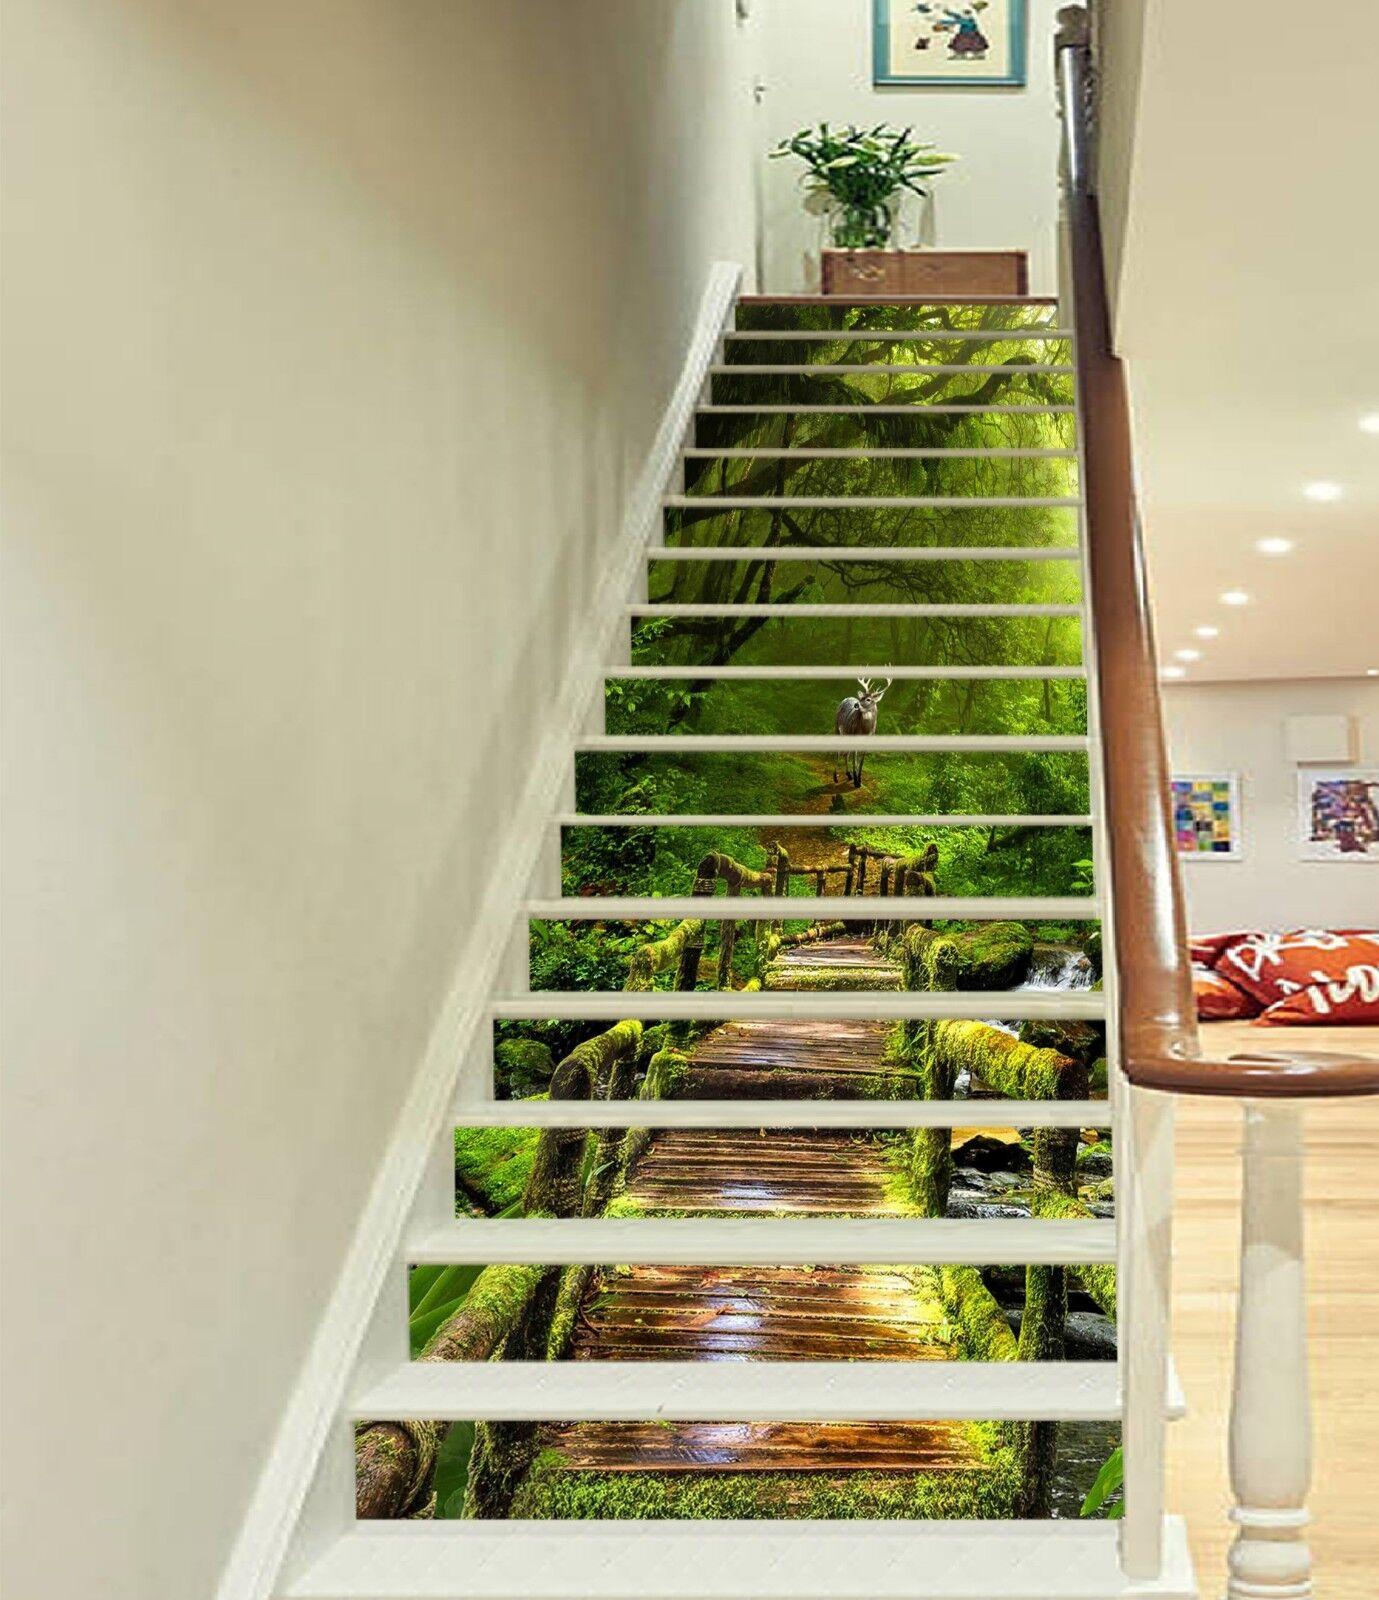 3D Wooden Bridge 3 Stair Risers Decoration Photo Mural Vinyl Decal WandPapier UK